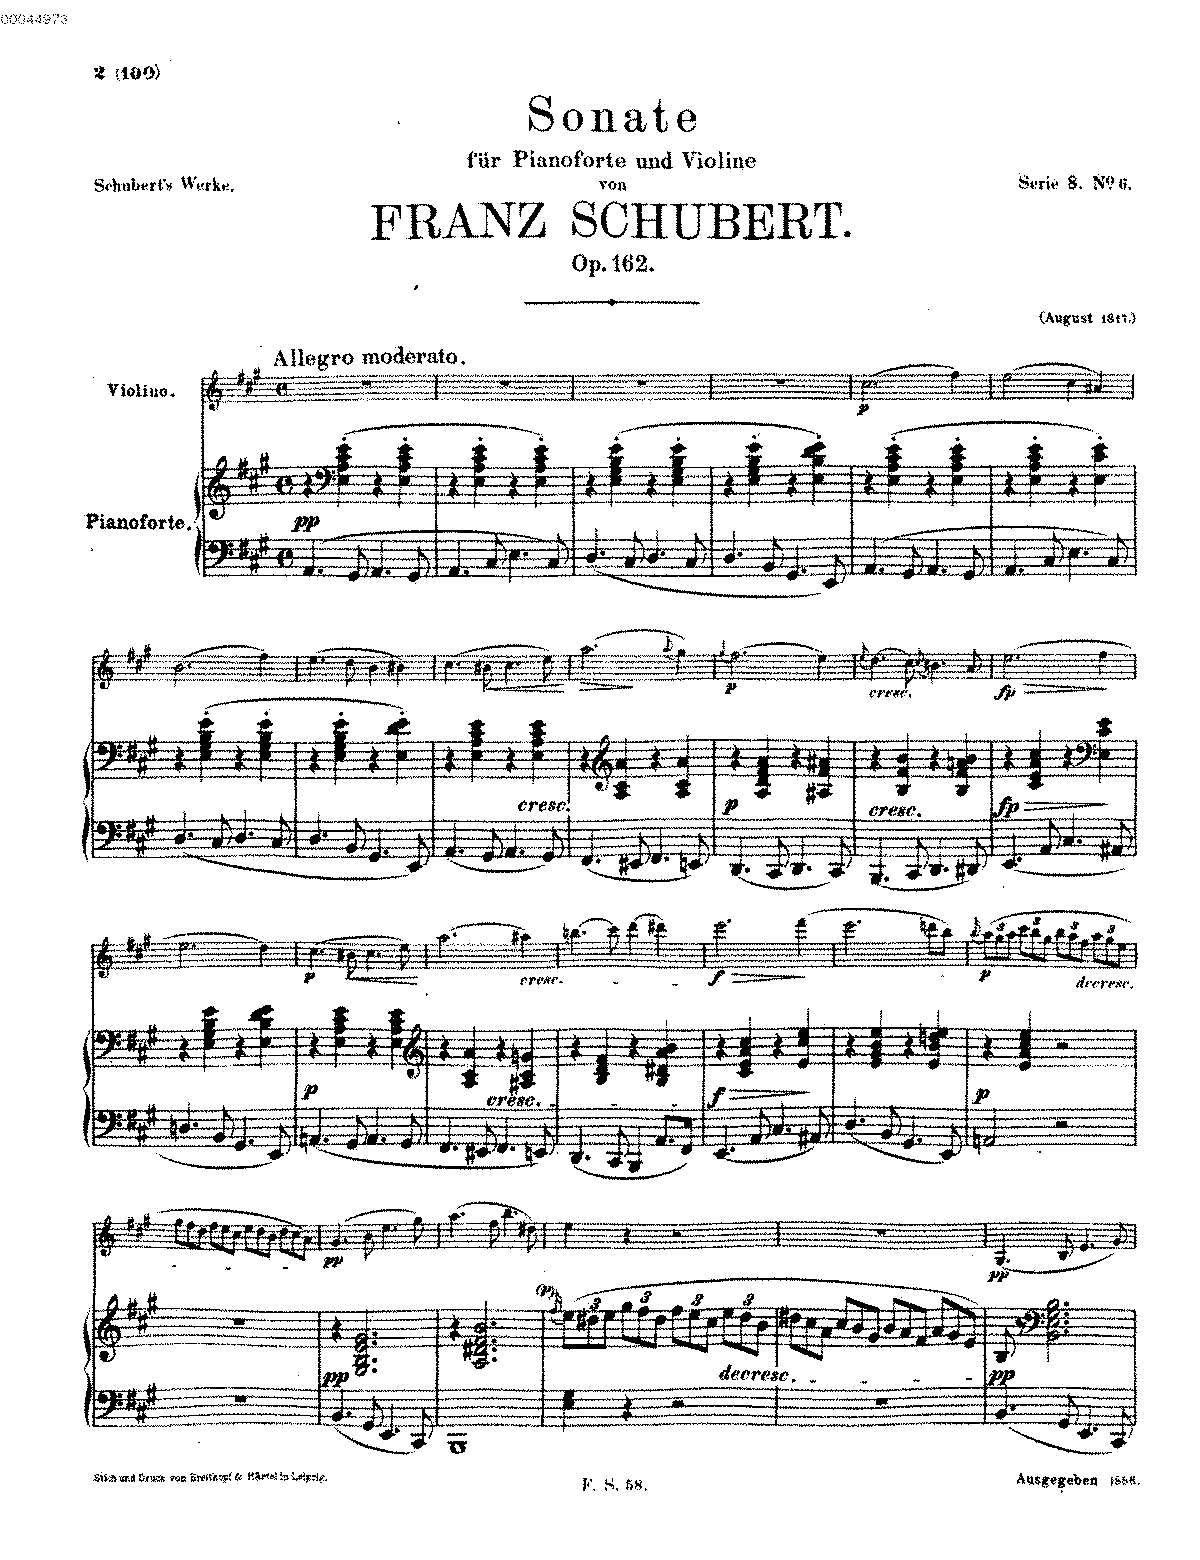 Violin Sonata, D 574 (Schubert, Franz) - IMSLP/Petrucci